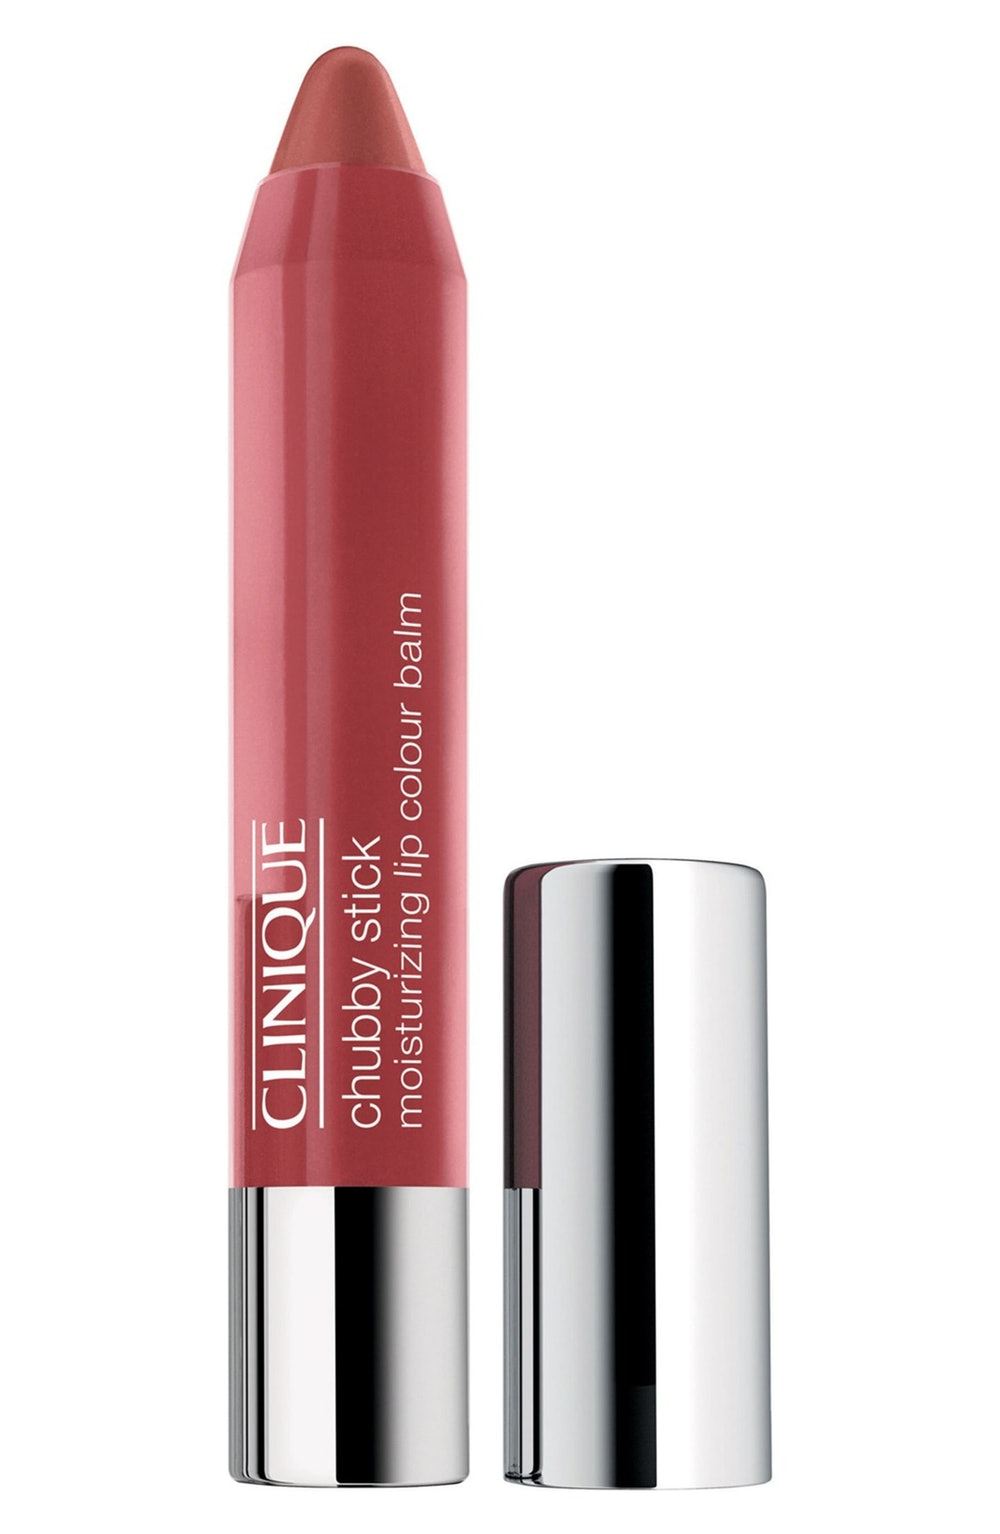 Chubby Stick Moisturizing Lip Color Balm